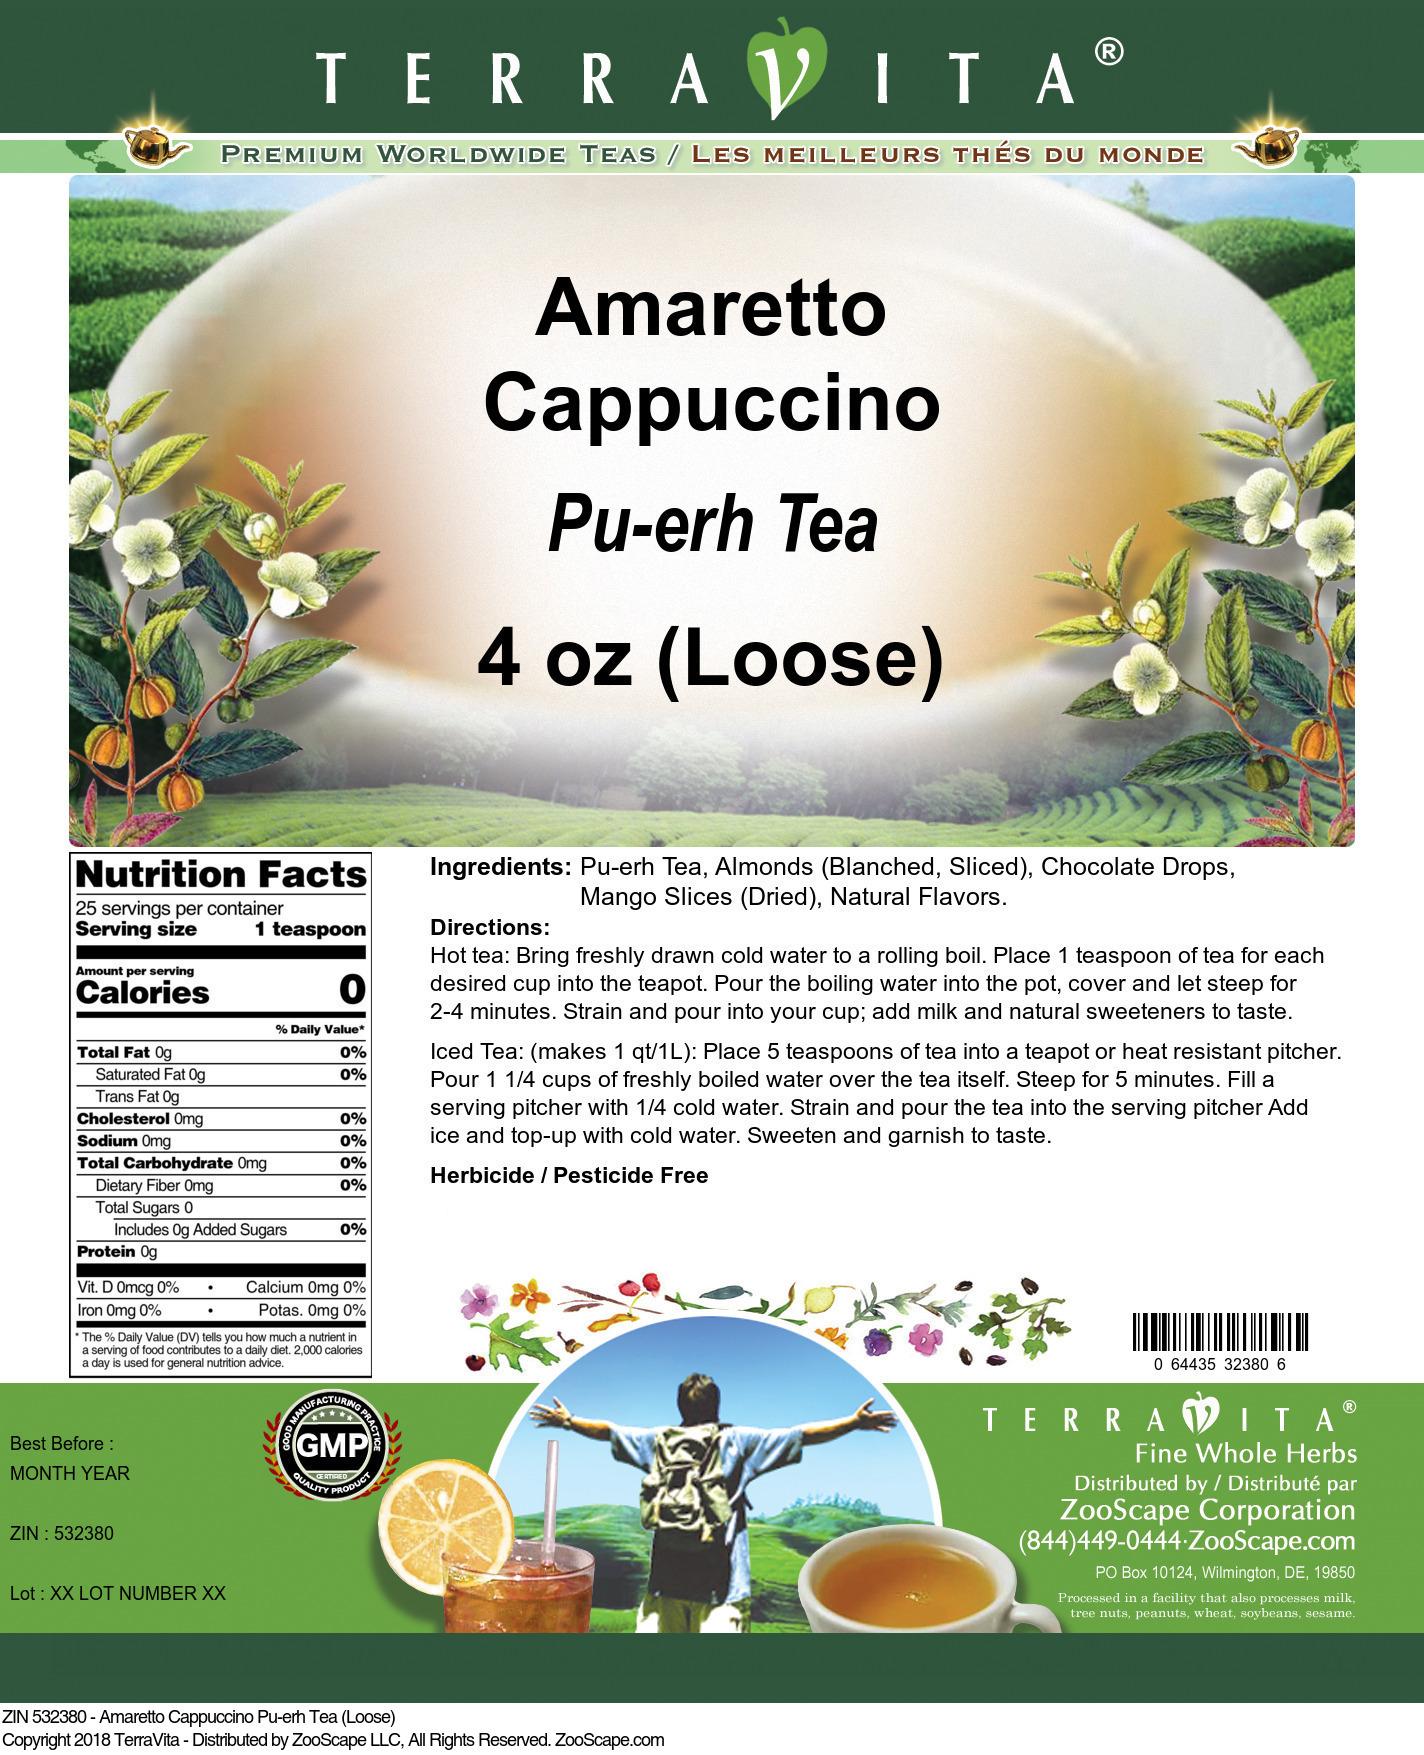 Amaretto Cappuccino Pu-erh Tea (Loose)